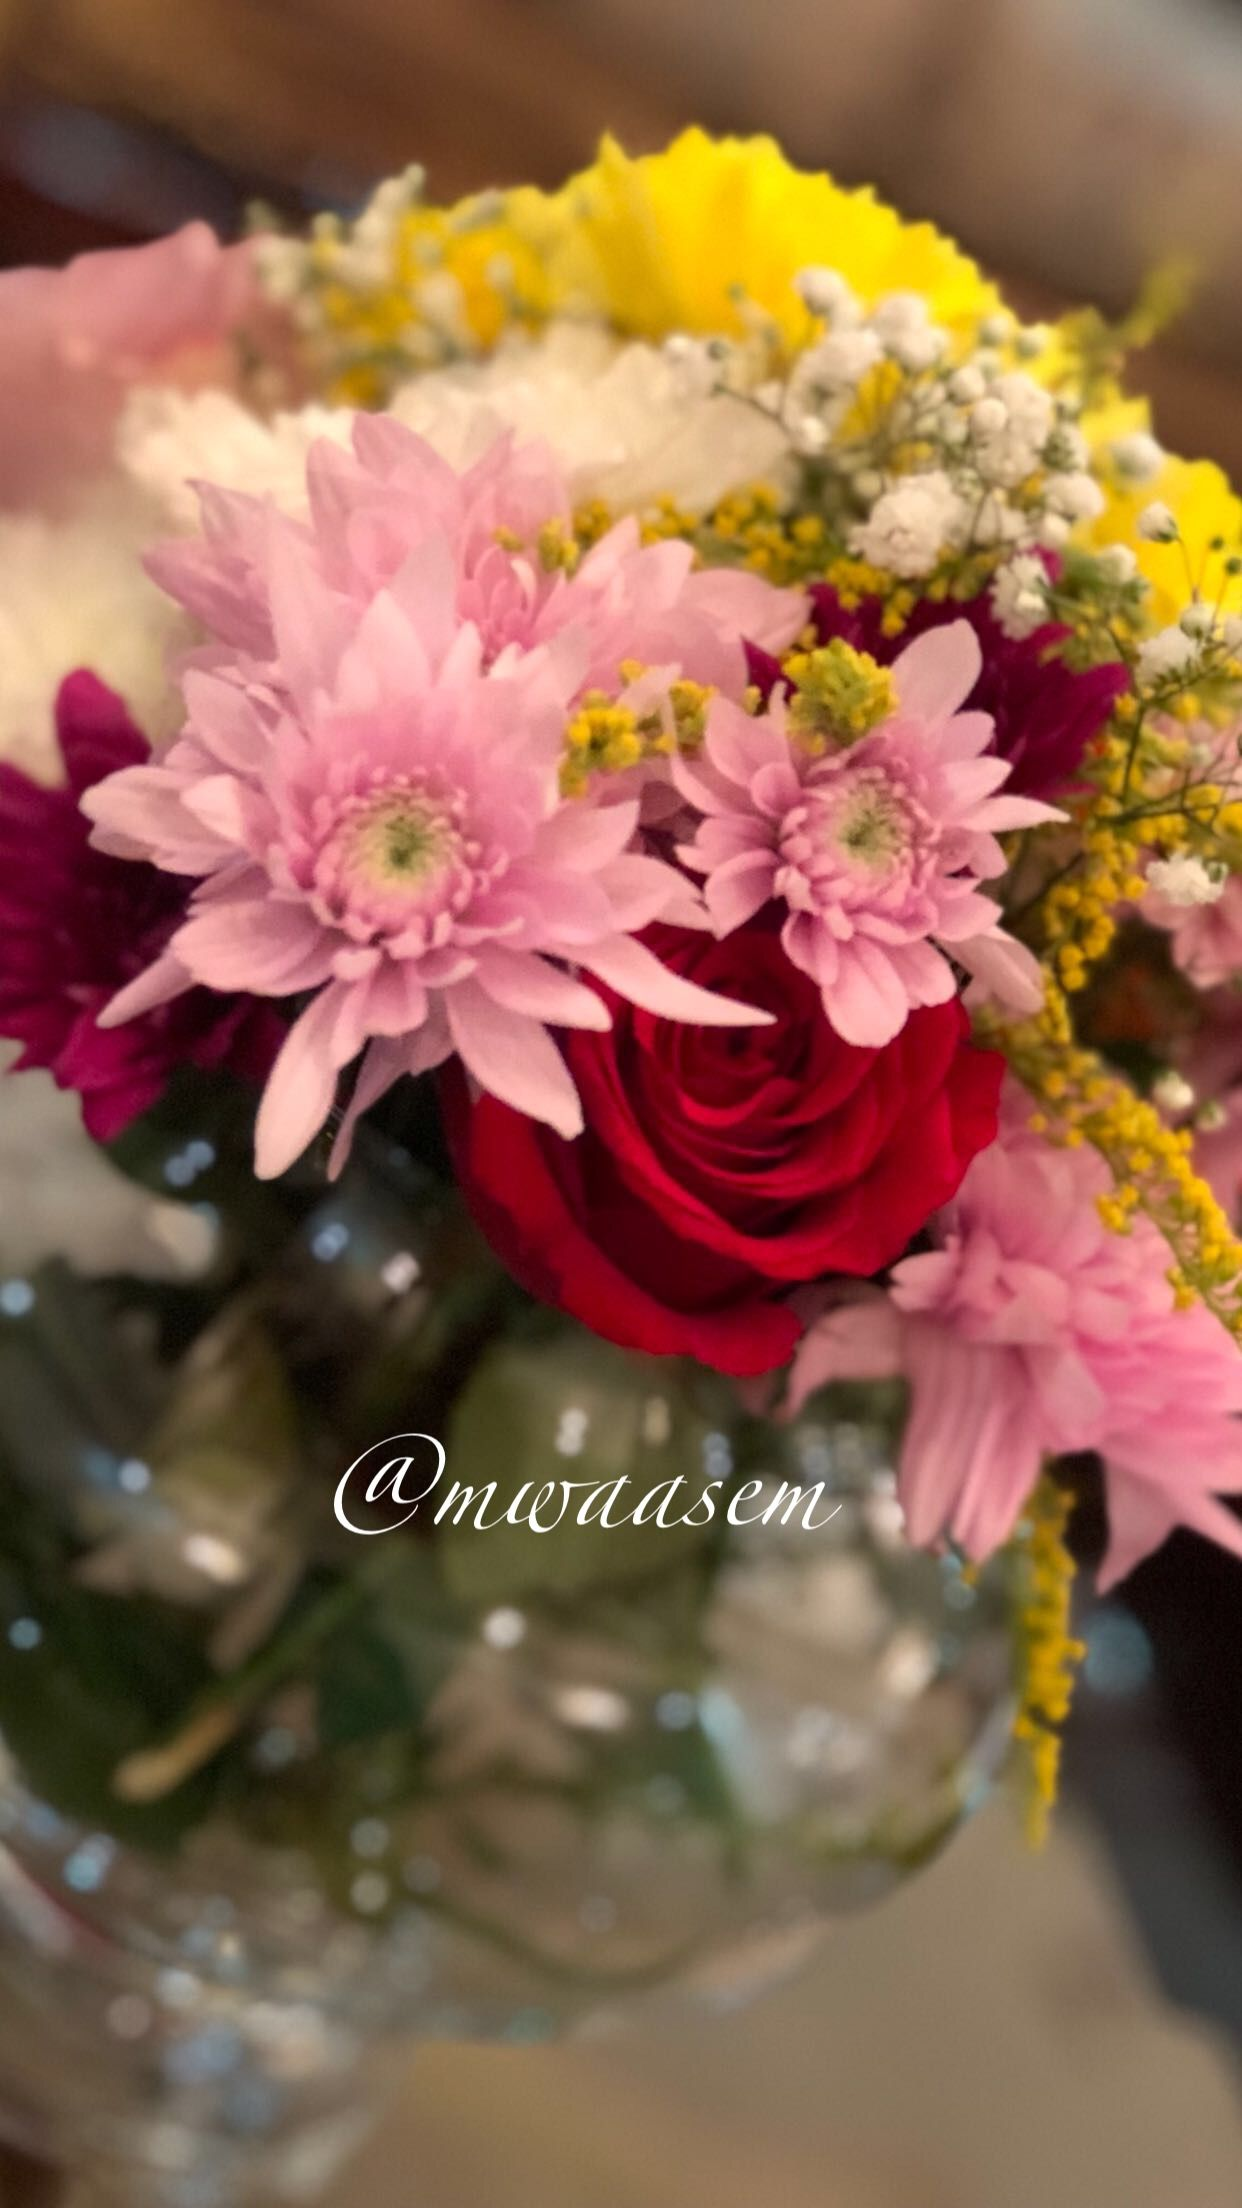 تنسيق فازات الورد من مواسم Mwaasem عرضها بسناب شات Rose Plants Flowers